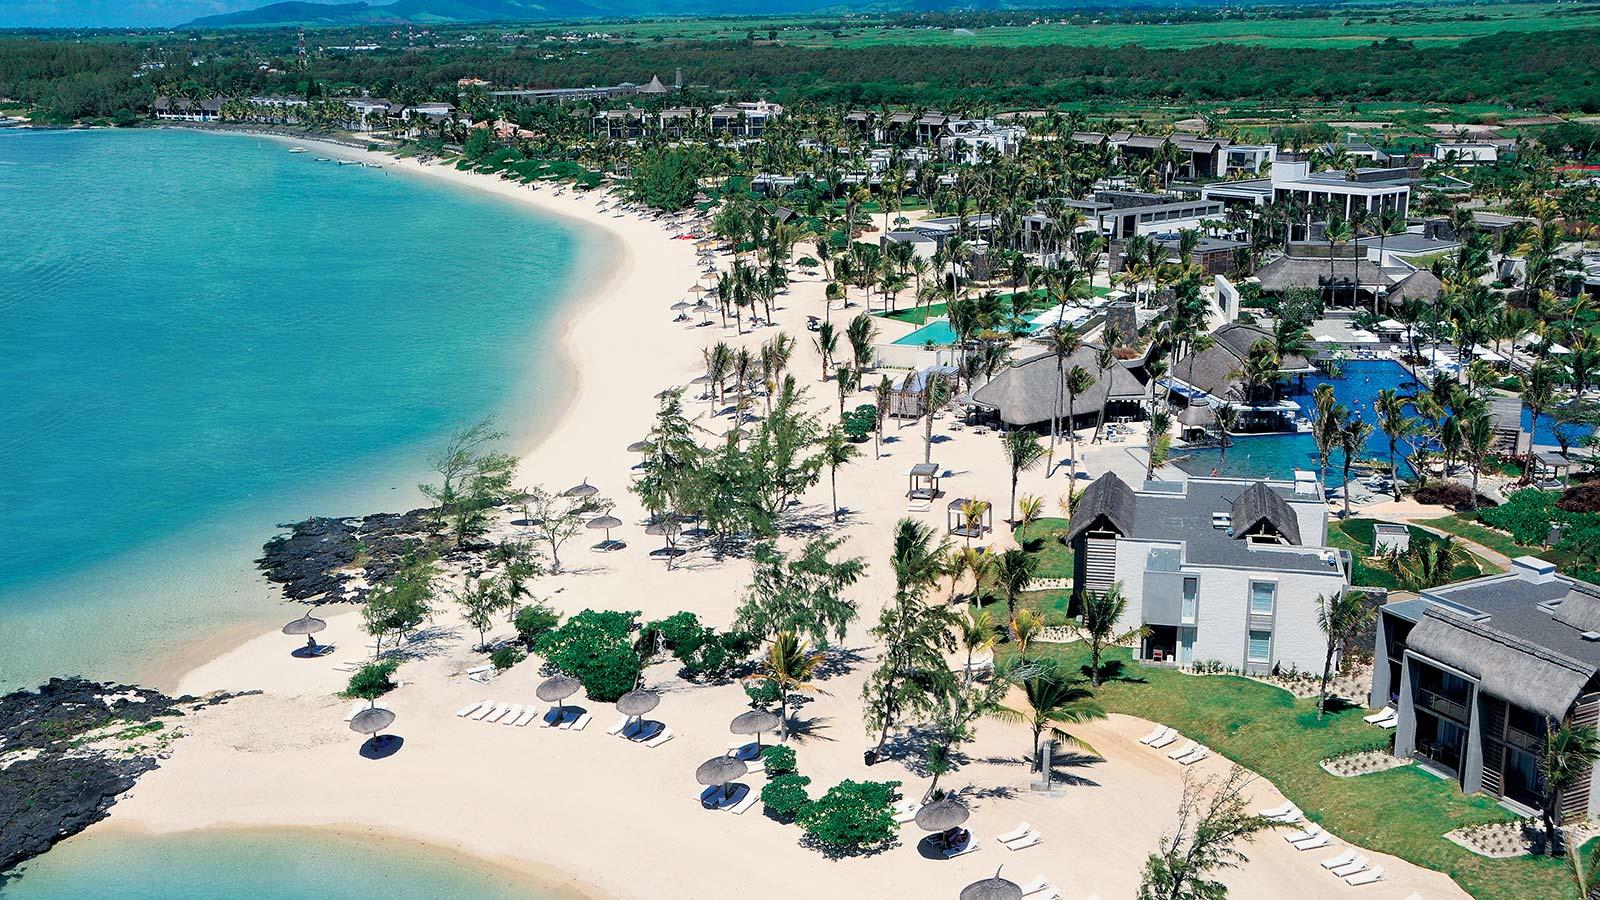 Long Beach Belle Mare, Mauritius